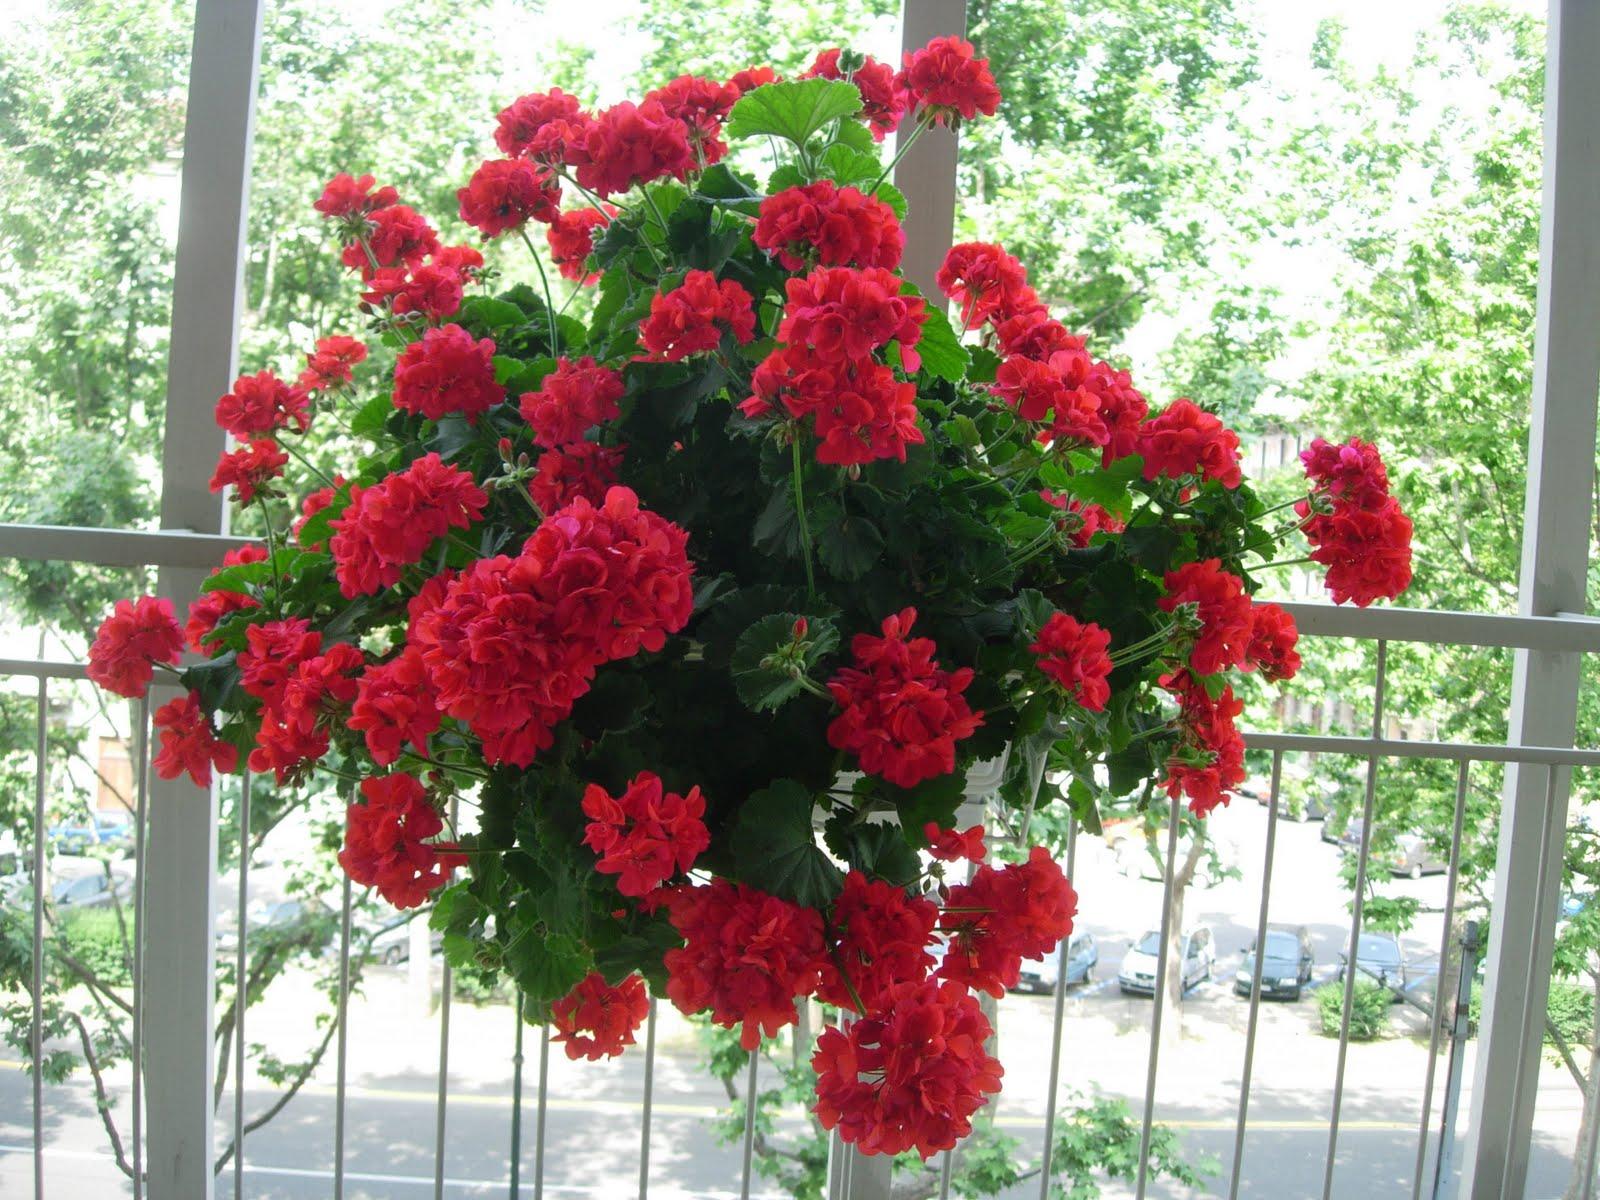 Cum sa ai grija de muscate ca sa fie pline de flori toata vara